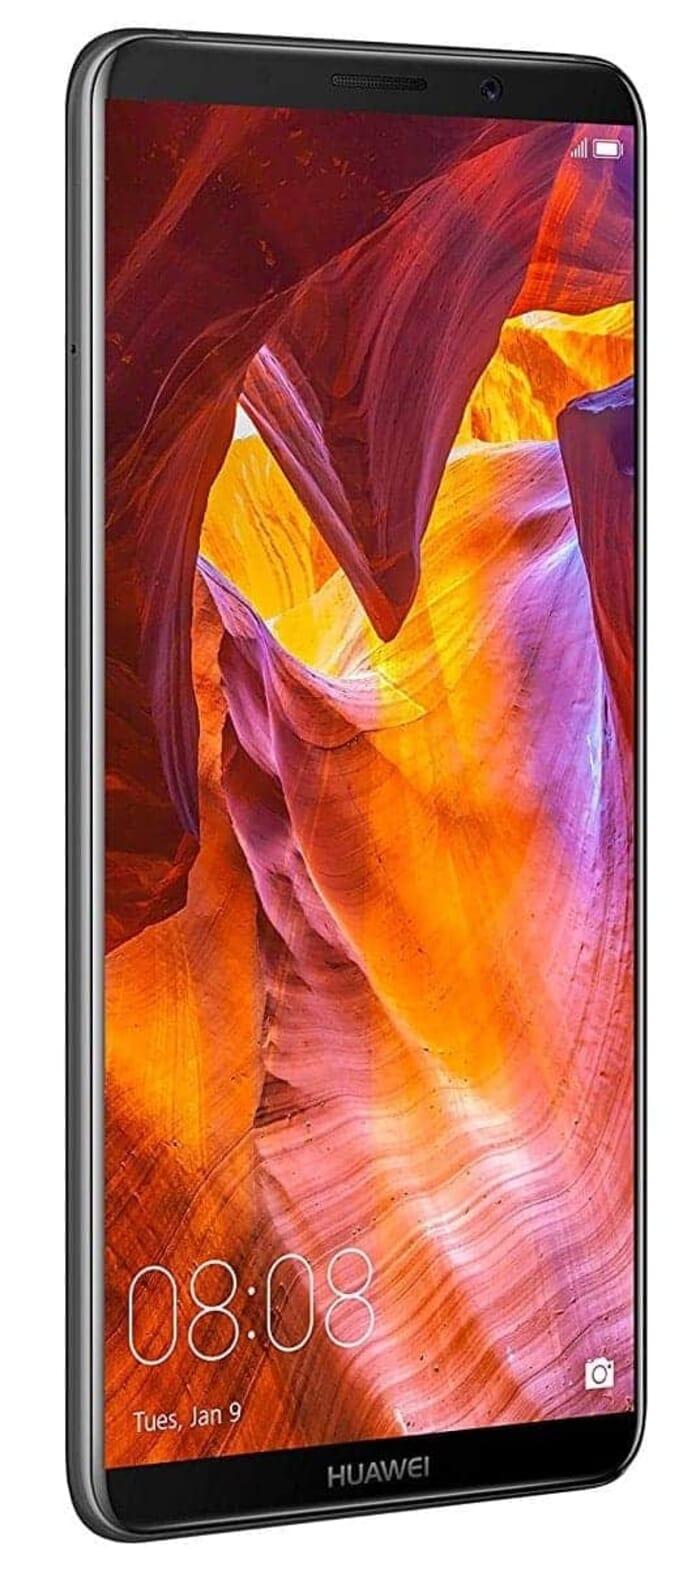 Huawei Mate 10 Pro Unlocked Phone 6 inch 6GB 128GB